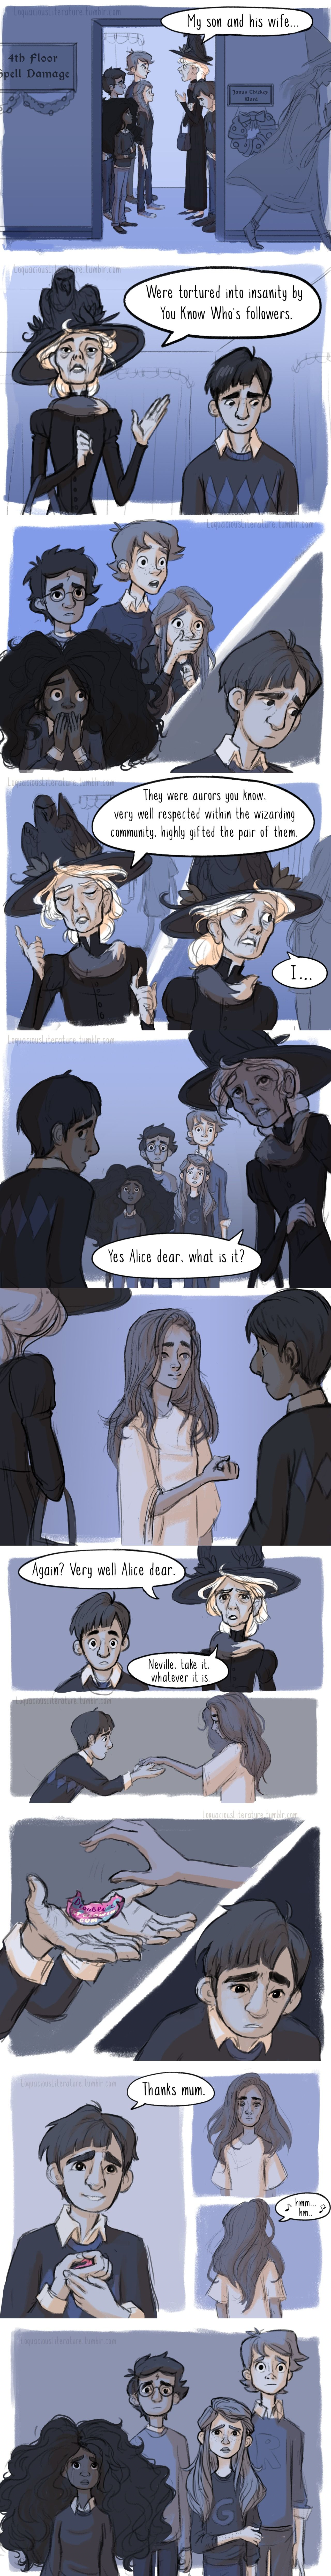 Harry Potter Book 5 Scene